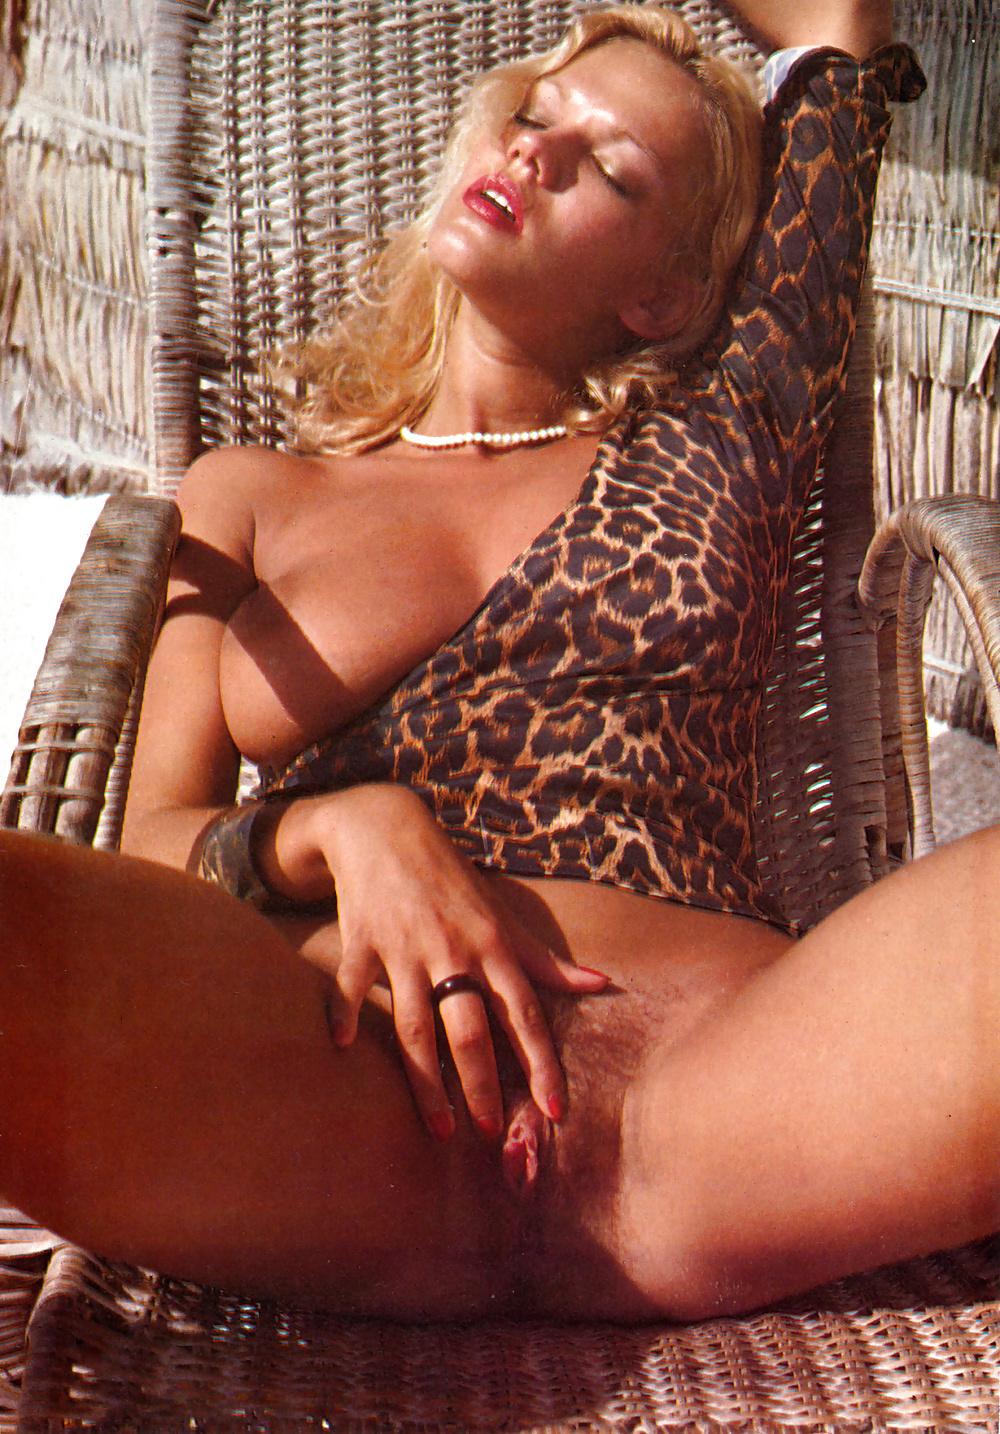 French pornstar brigitte lahaie retrofucking